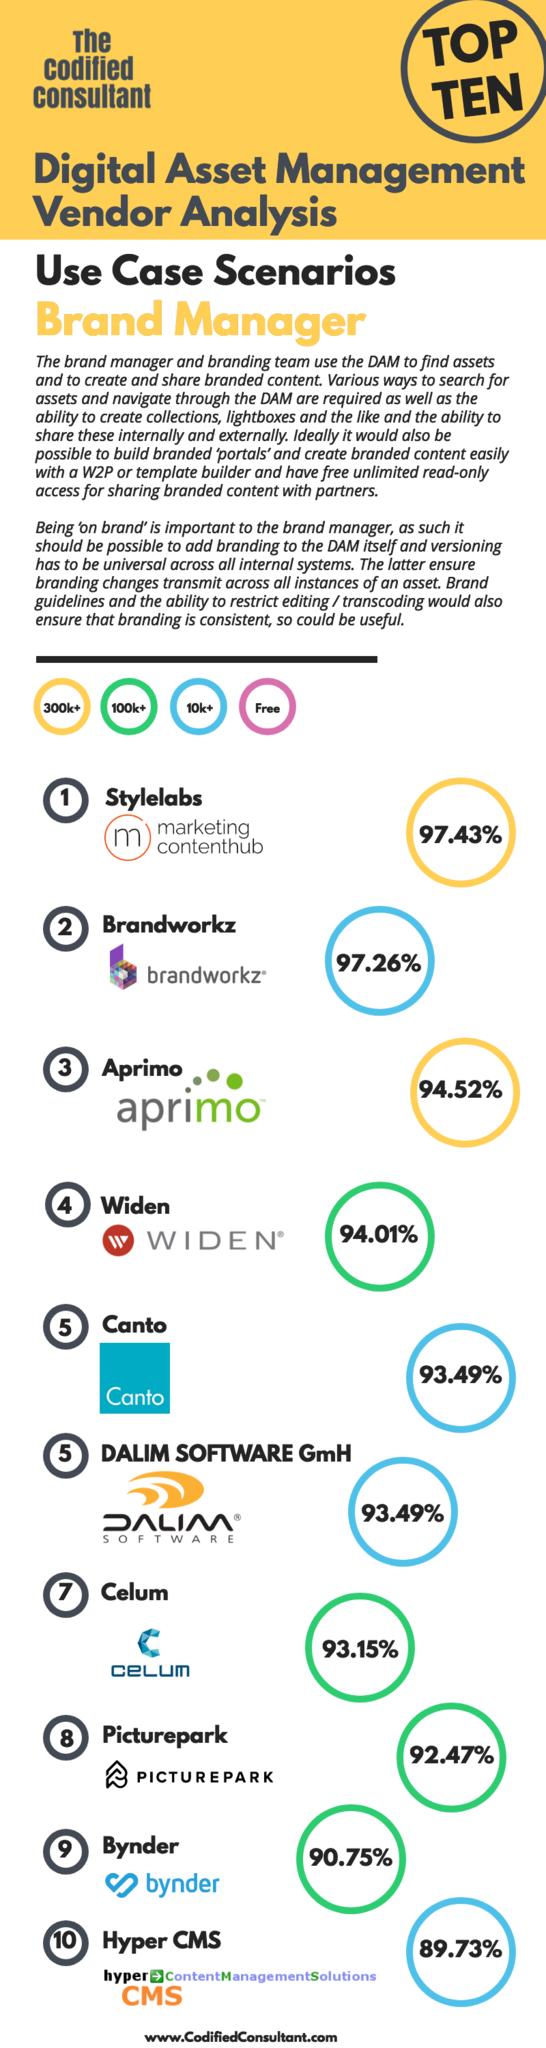 Top Ten by Use Case Scenario Brand Manager